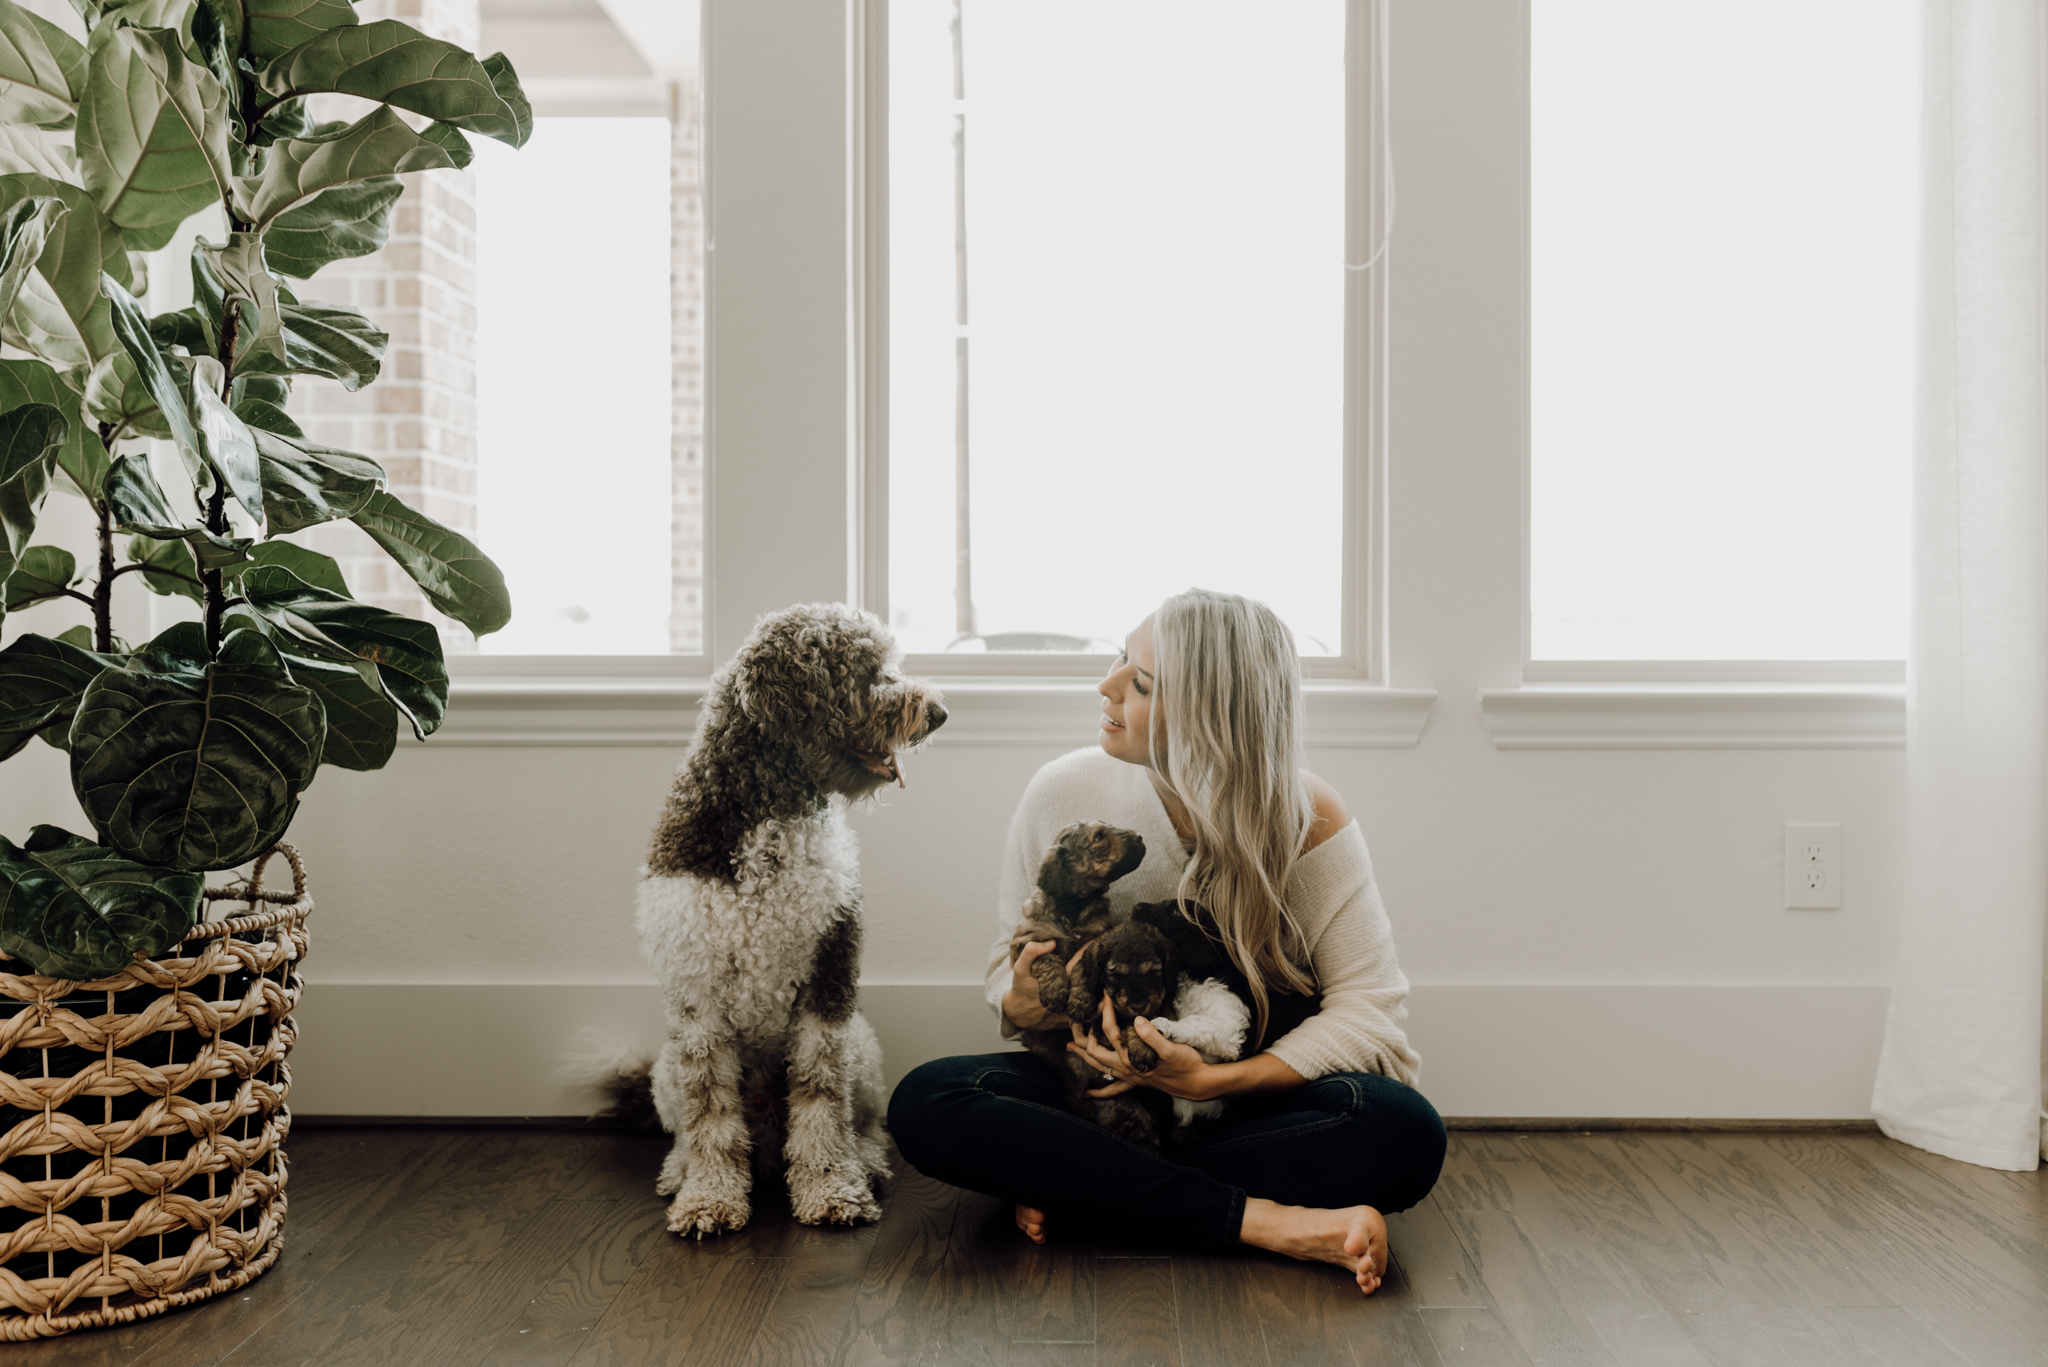 houston-wedding-photographer-in-home-maternity-session-puppies- Houston Wedding Photographer -Kristen Giles Photography-65.jpg